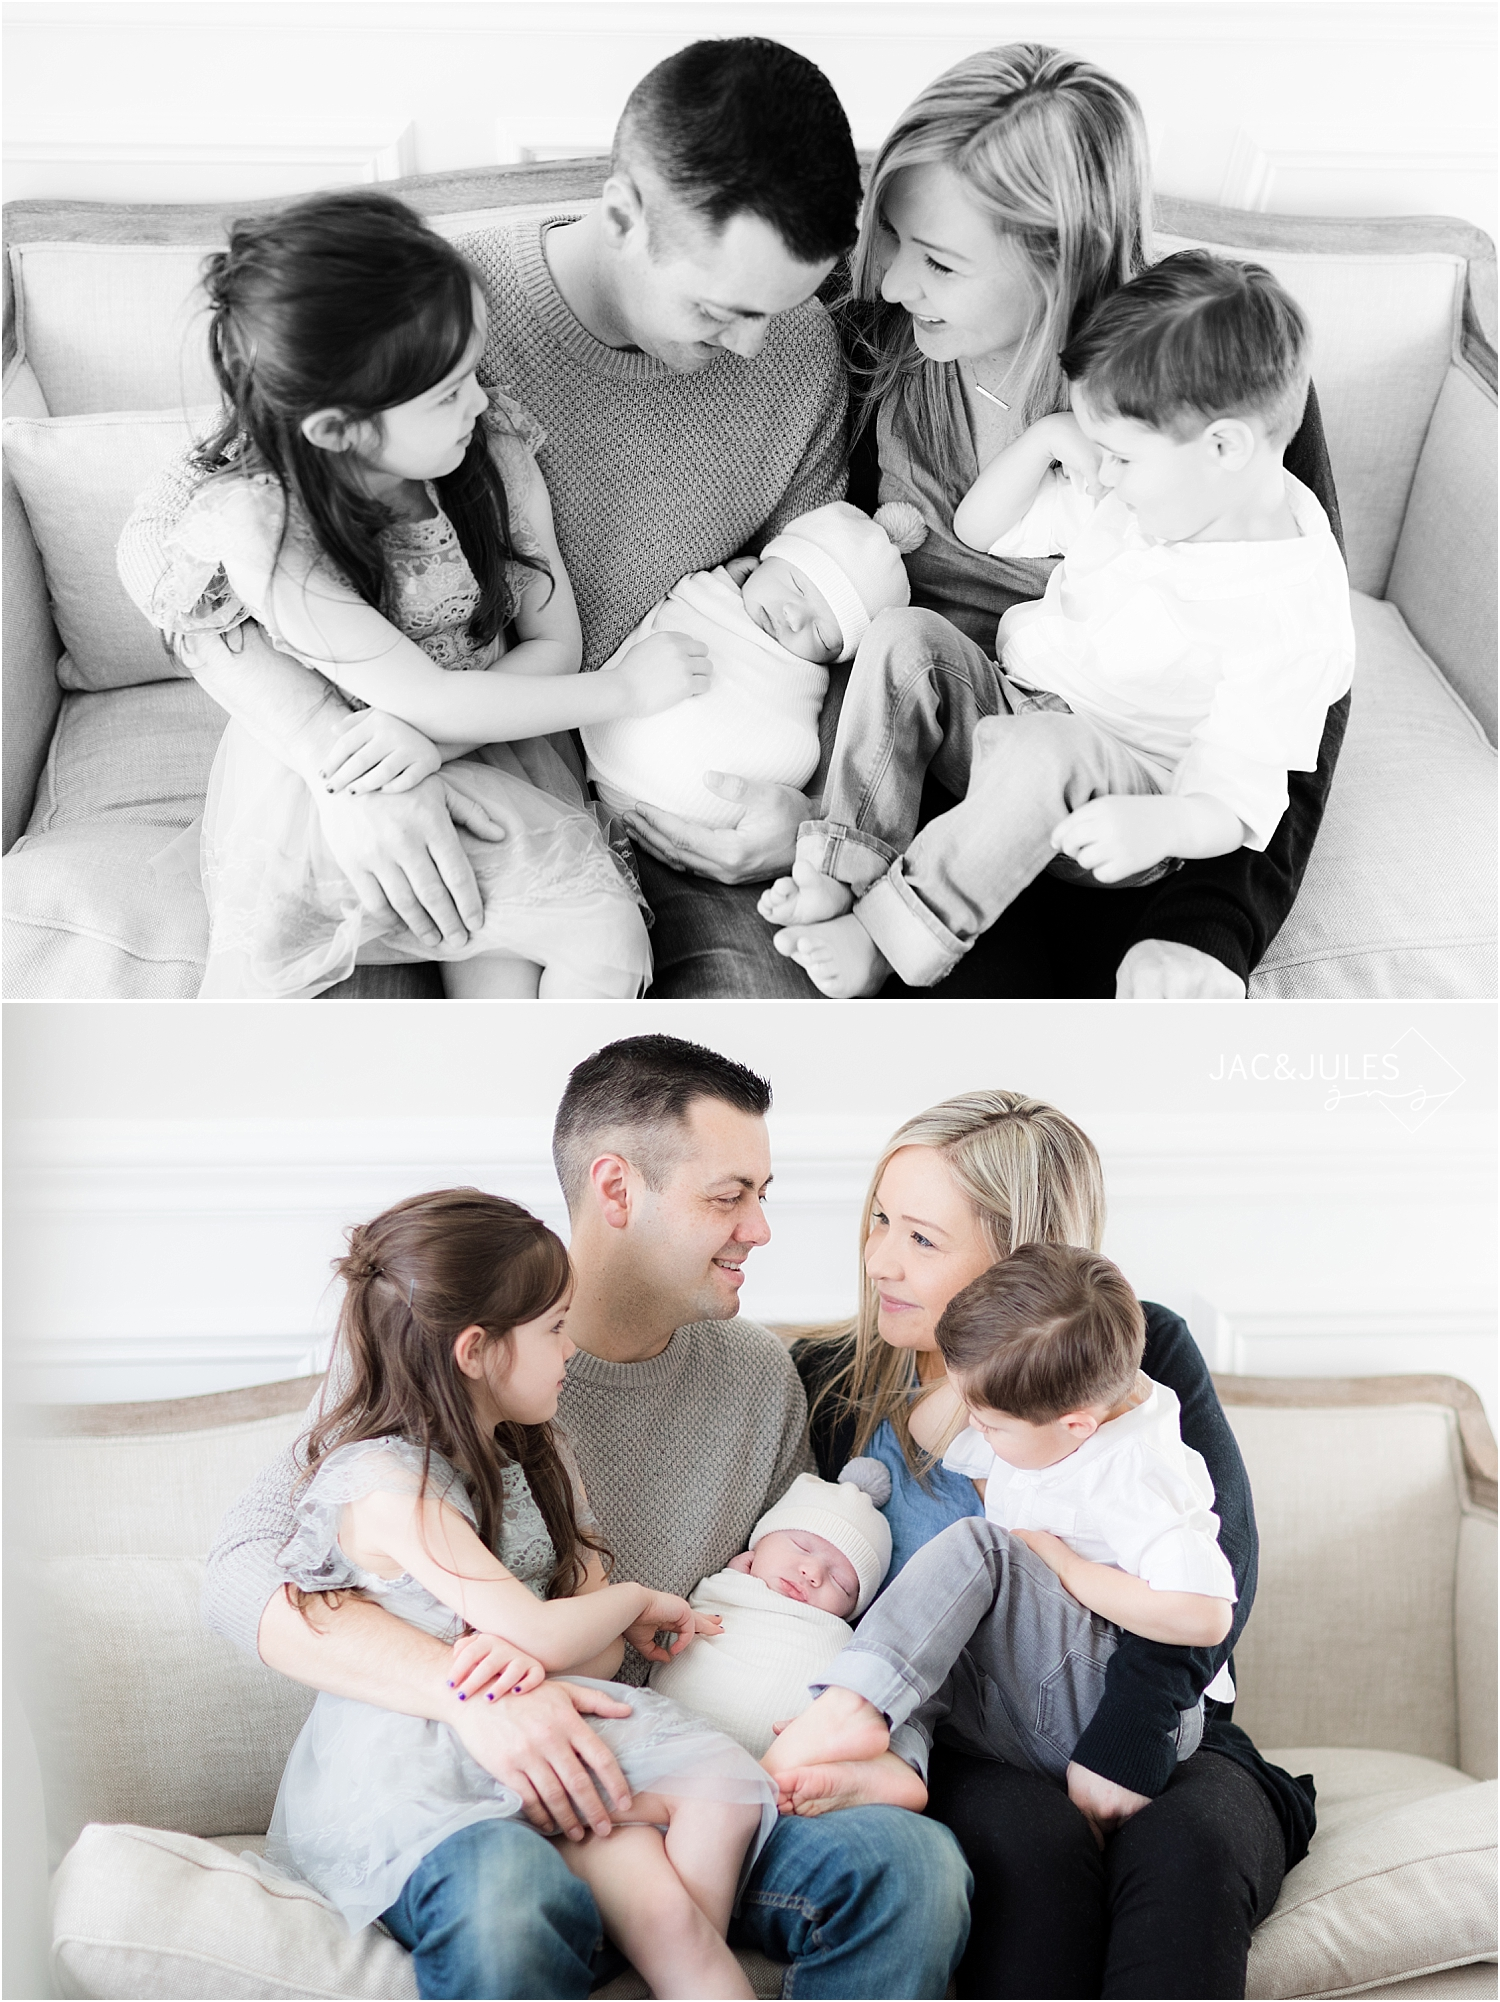 natural family newborn photo in toms river nj home